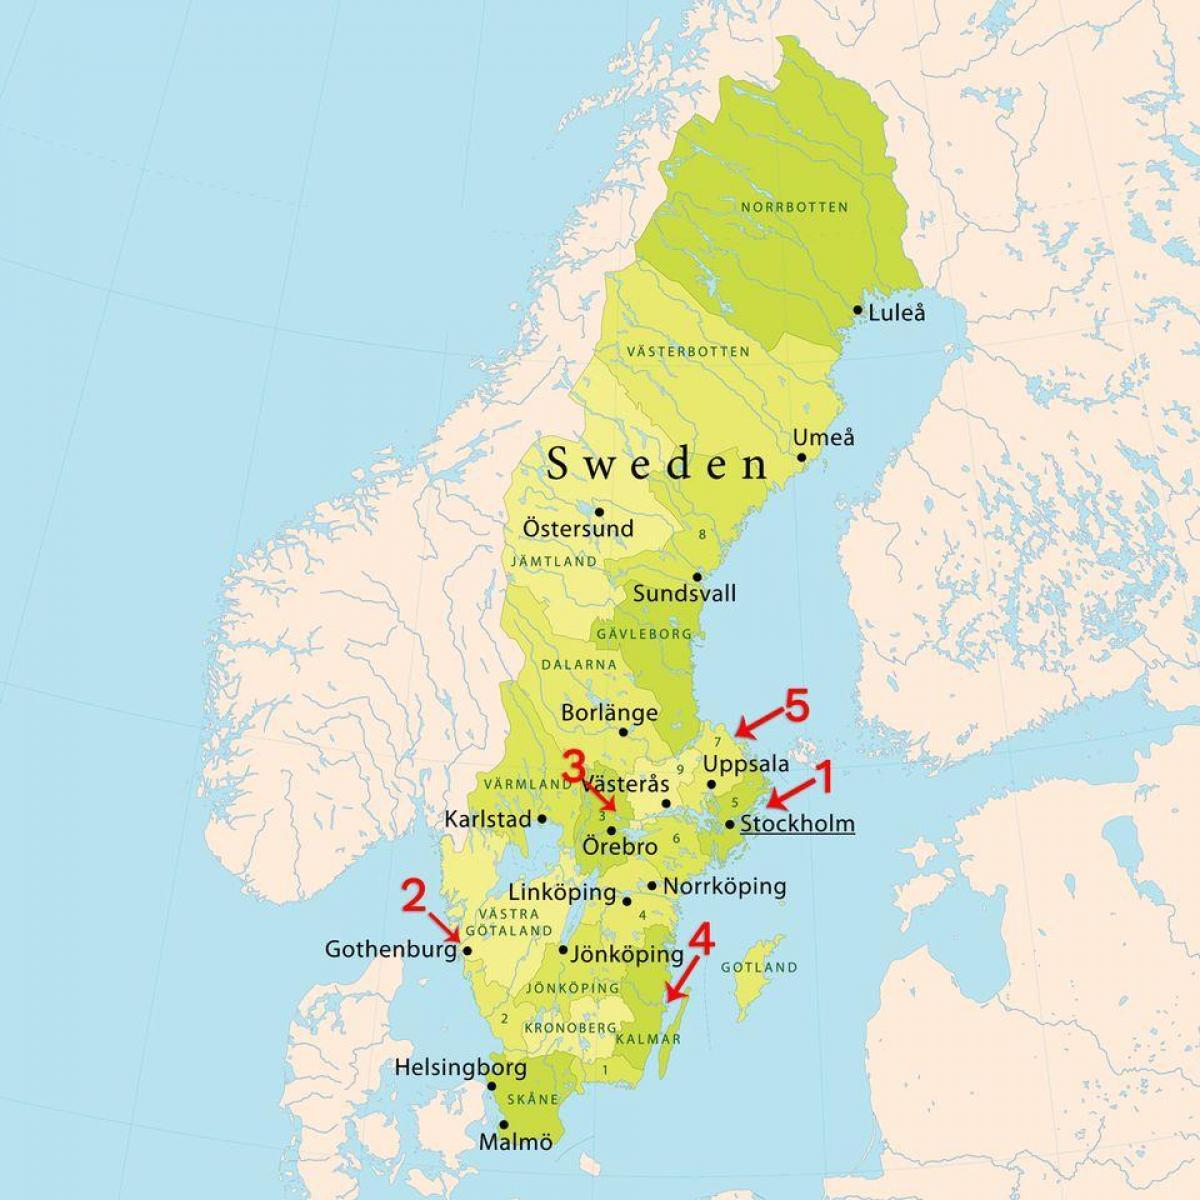 Karta Sverige Borlange.Stockholm Strander Karta Karta Over Stockholm Strander